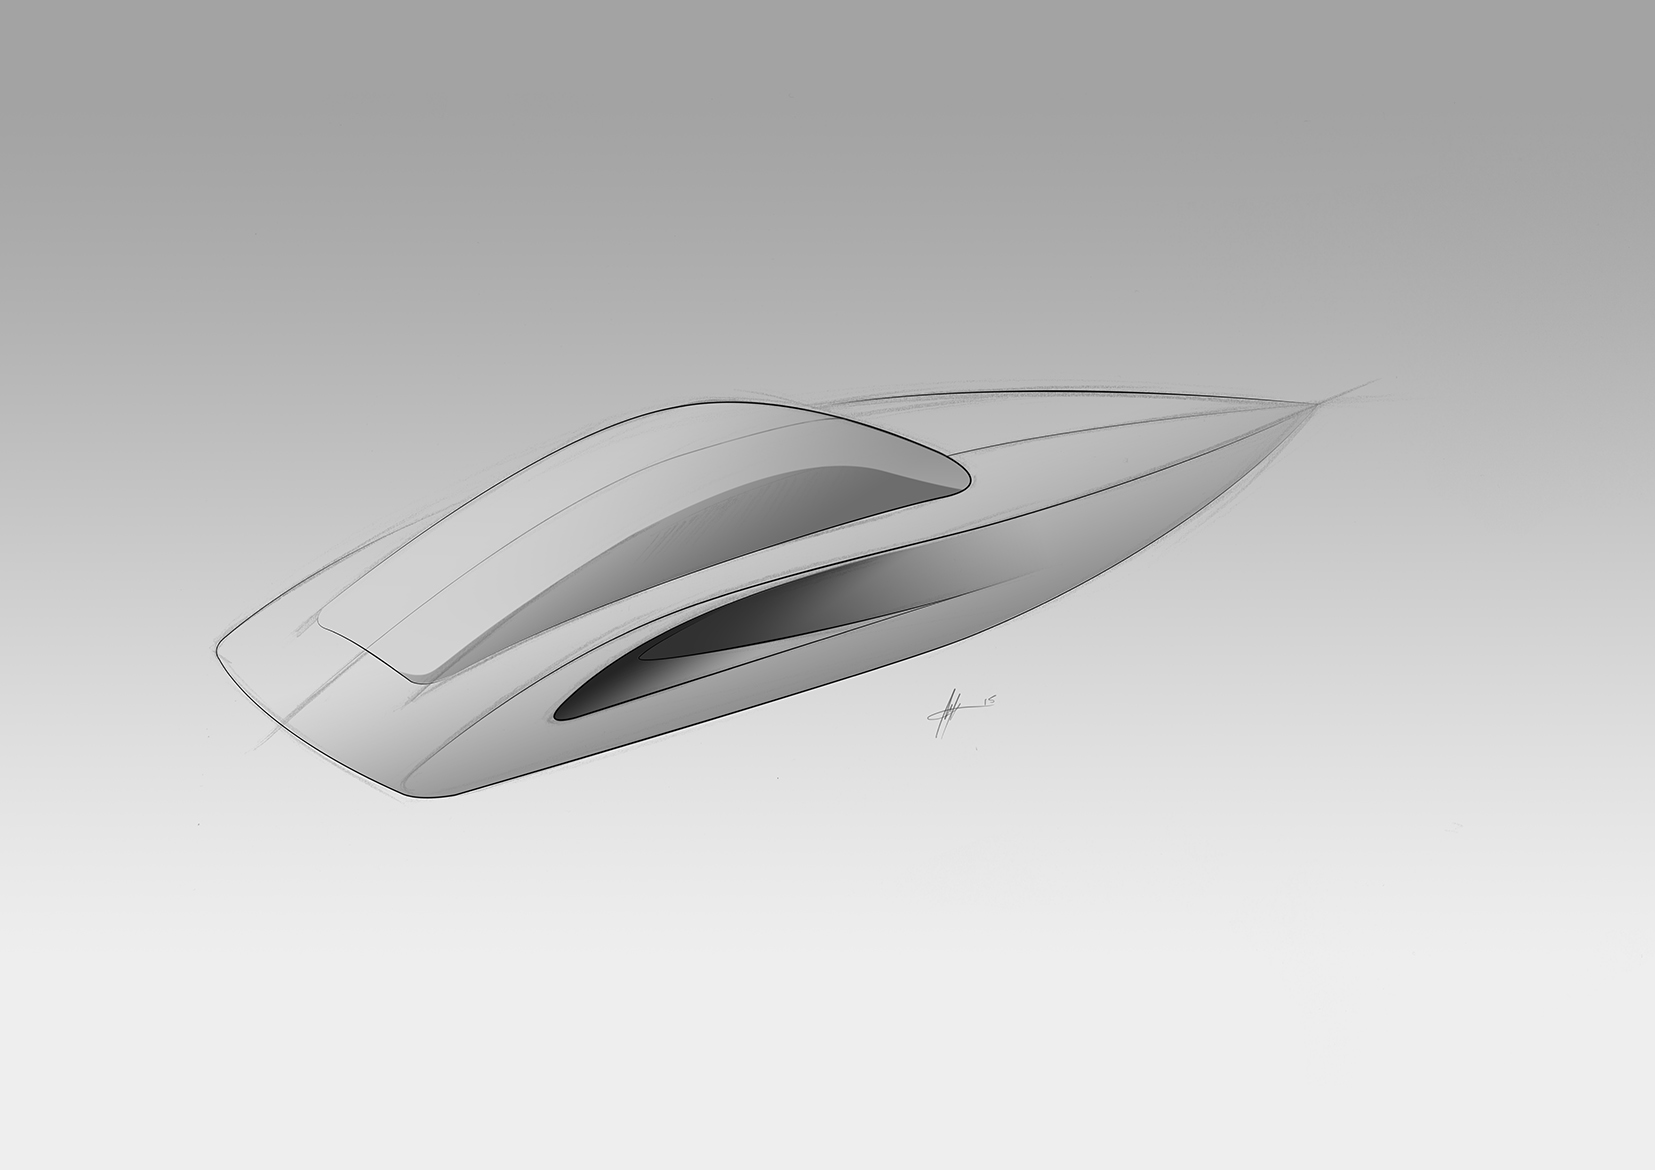 Concept_Render_2_small.jpg